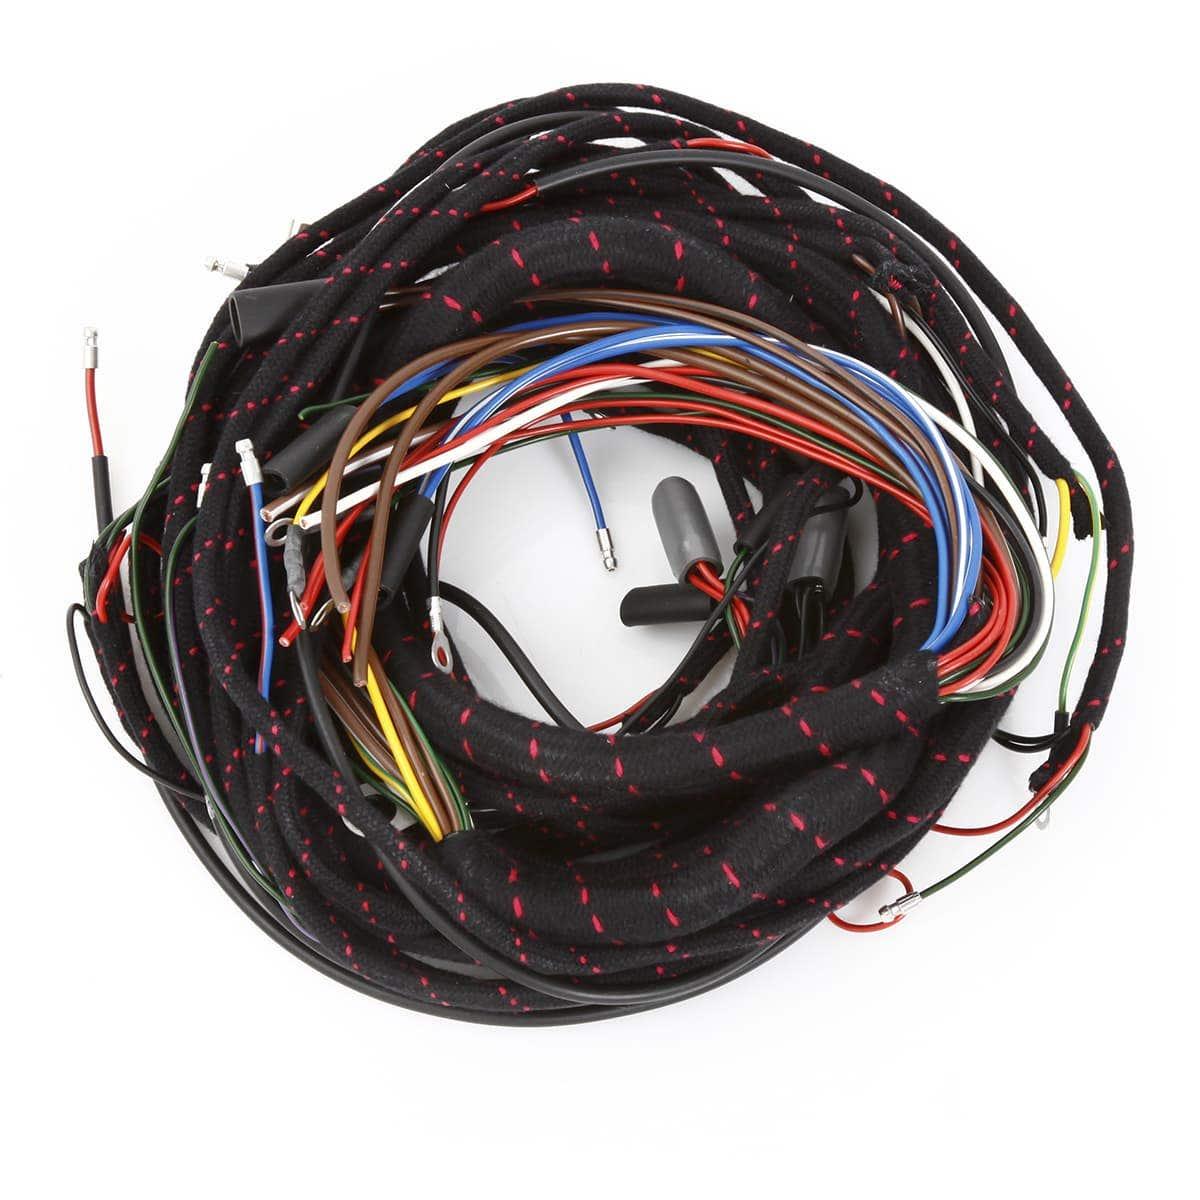 357-060 WIRING HARNESS (lacquer-id) | Moss Motors on mg td chassis, mg td heater, mg td frame, mg td turn signals, mg td dimensions, mg td speedometer, mg td clock, mg tf wiring diagram, mg td specifications, mg td manual, mg td distributor, mg td transmission, mg td parts catalog, mg td wiring harness installation, mg td wiper motor, mg td headlights, mg td rear suspension, mg td generator, mg td cooling system,